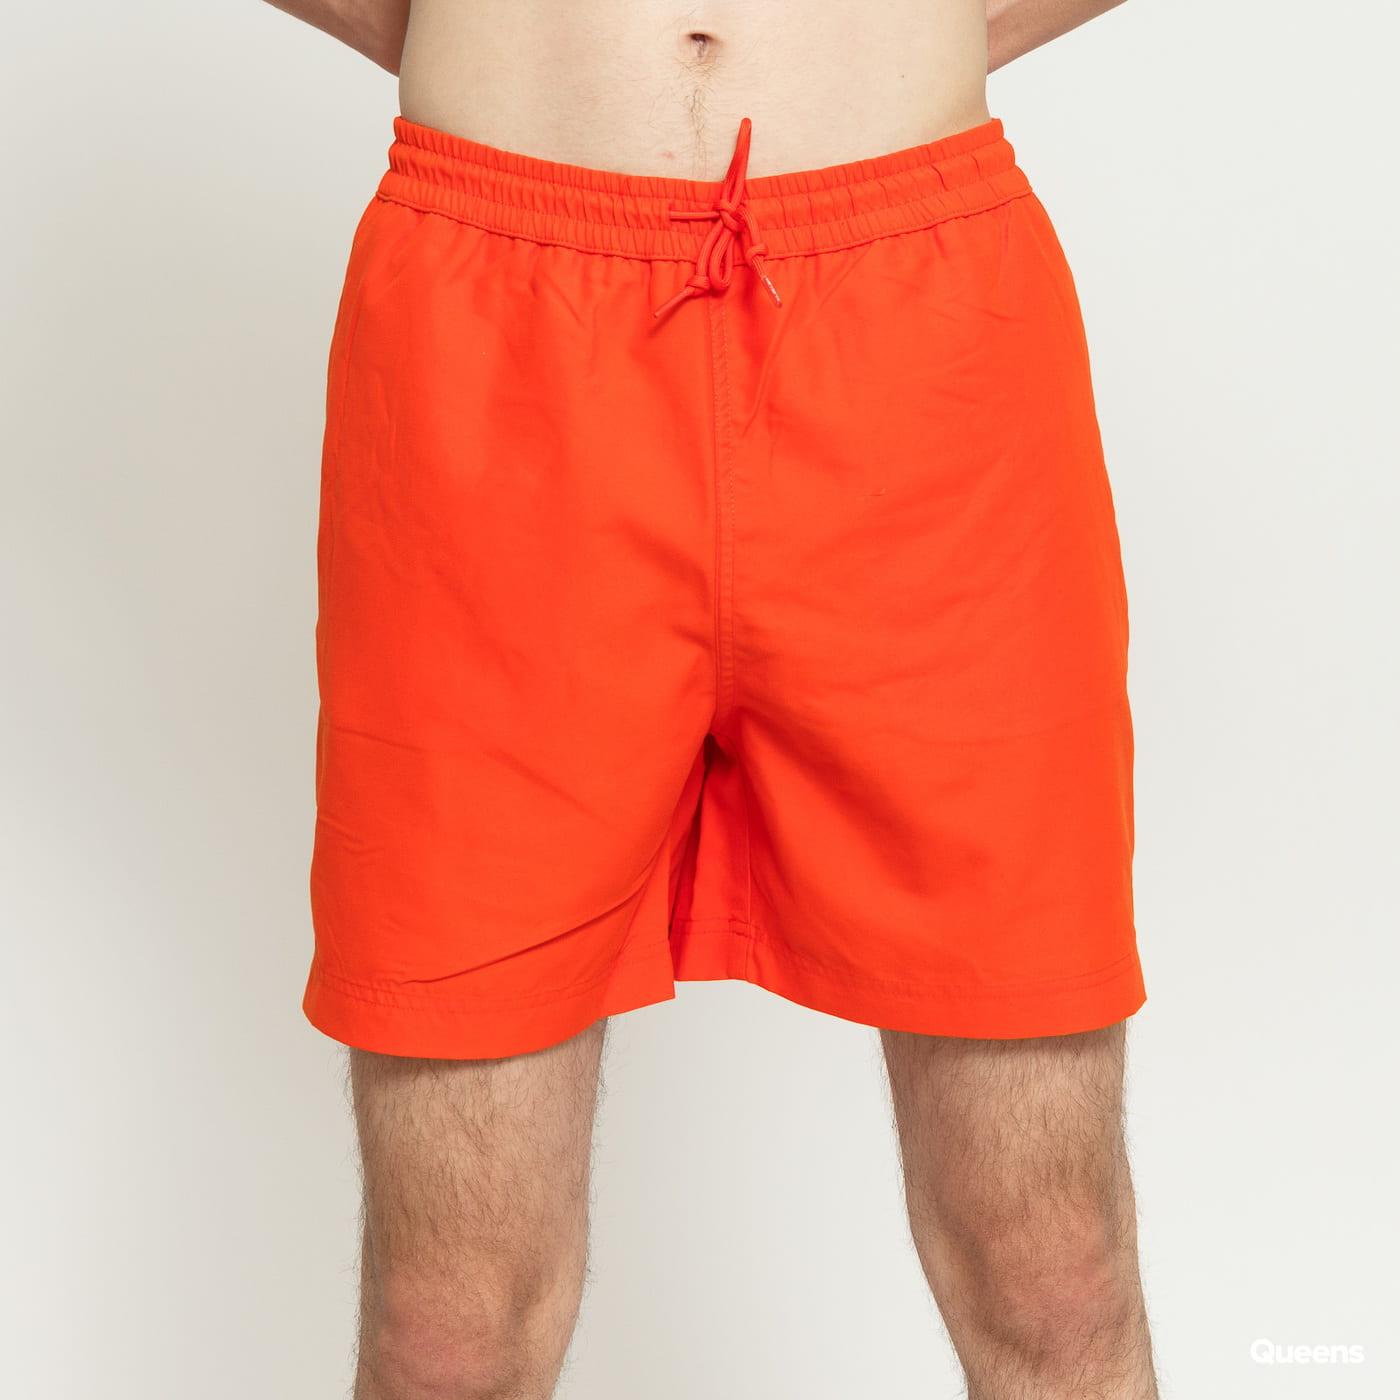 bfcba8bdbc52b Zoom in Zoom in Zoom in Zoom in Zoom in. Carhartt WIP Chase Swim Trunks  orange